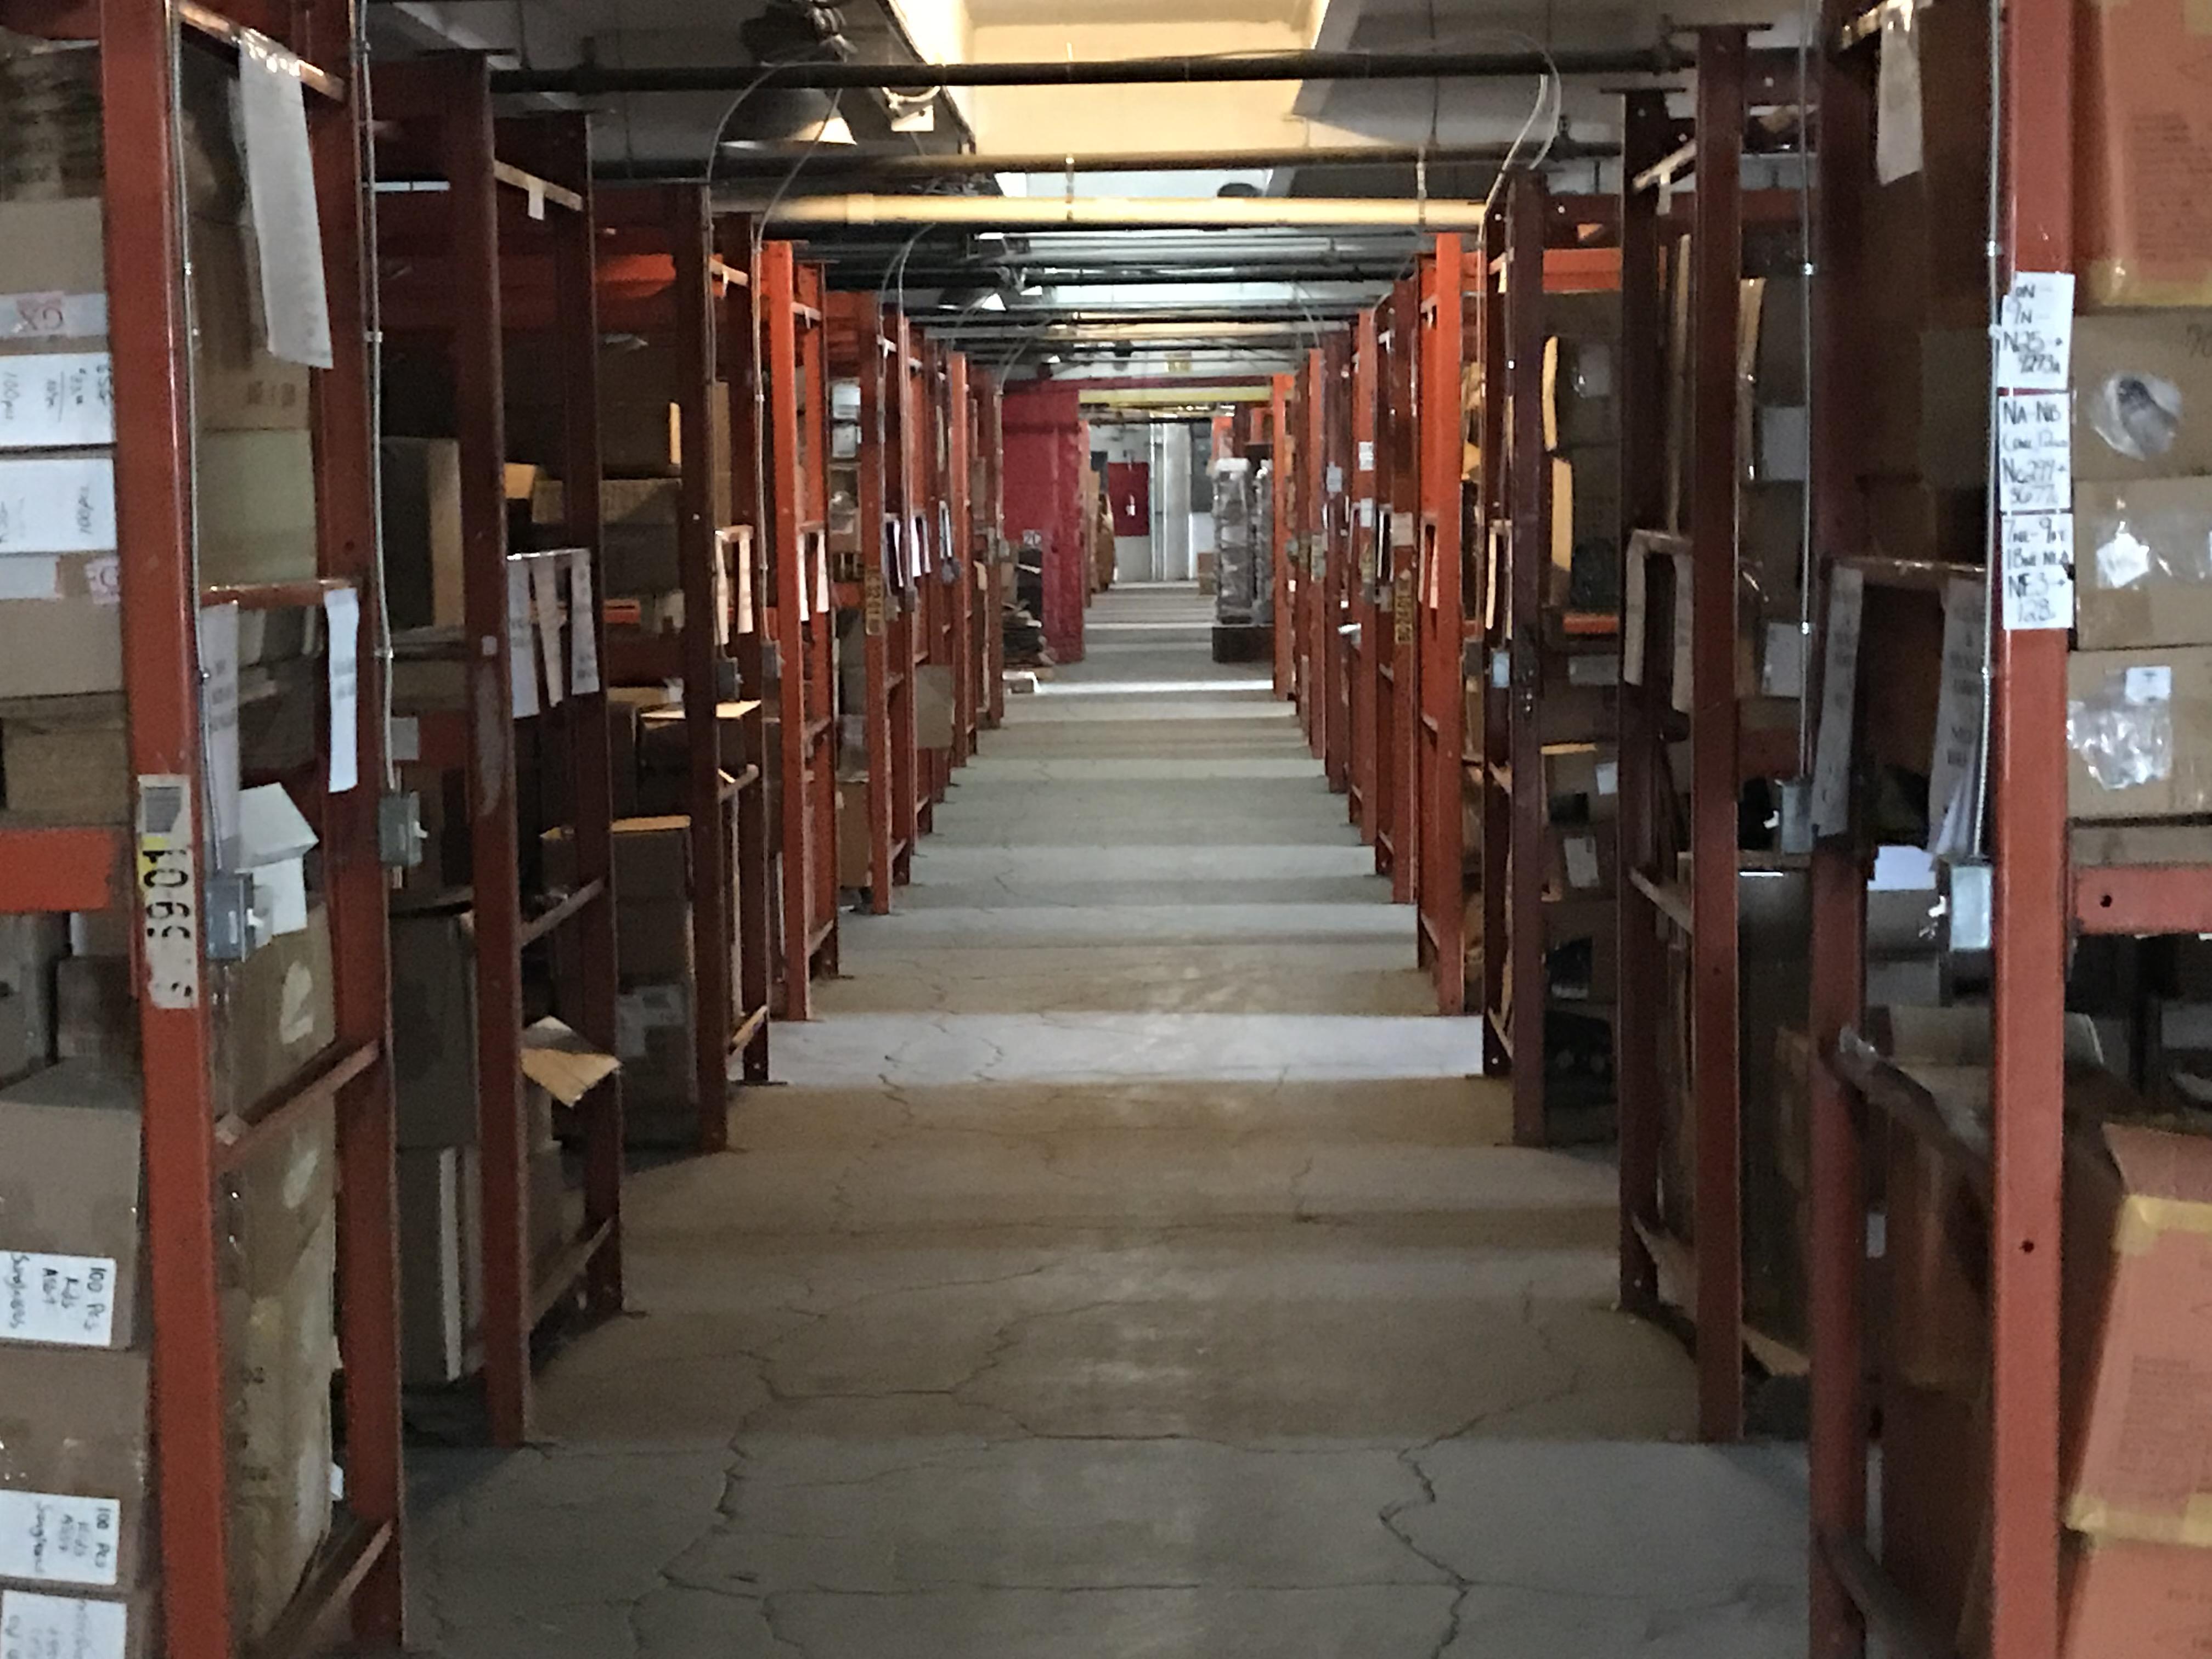 conklin-fashions-warehouse-aisle.jpg